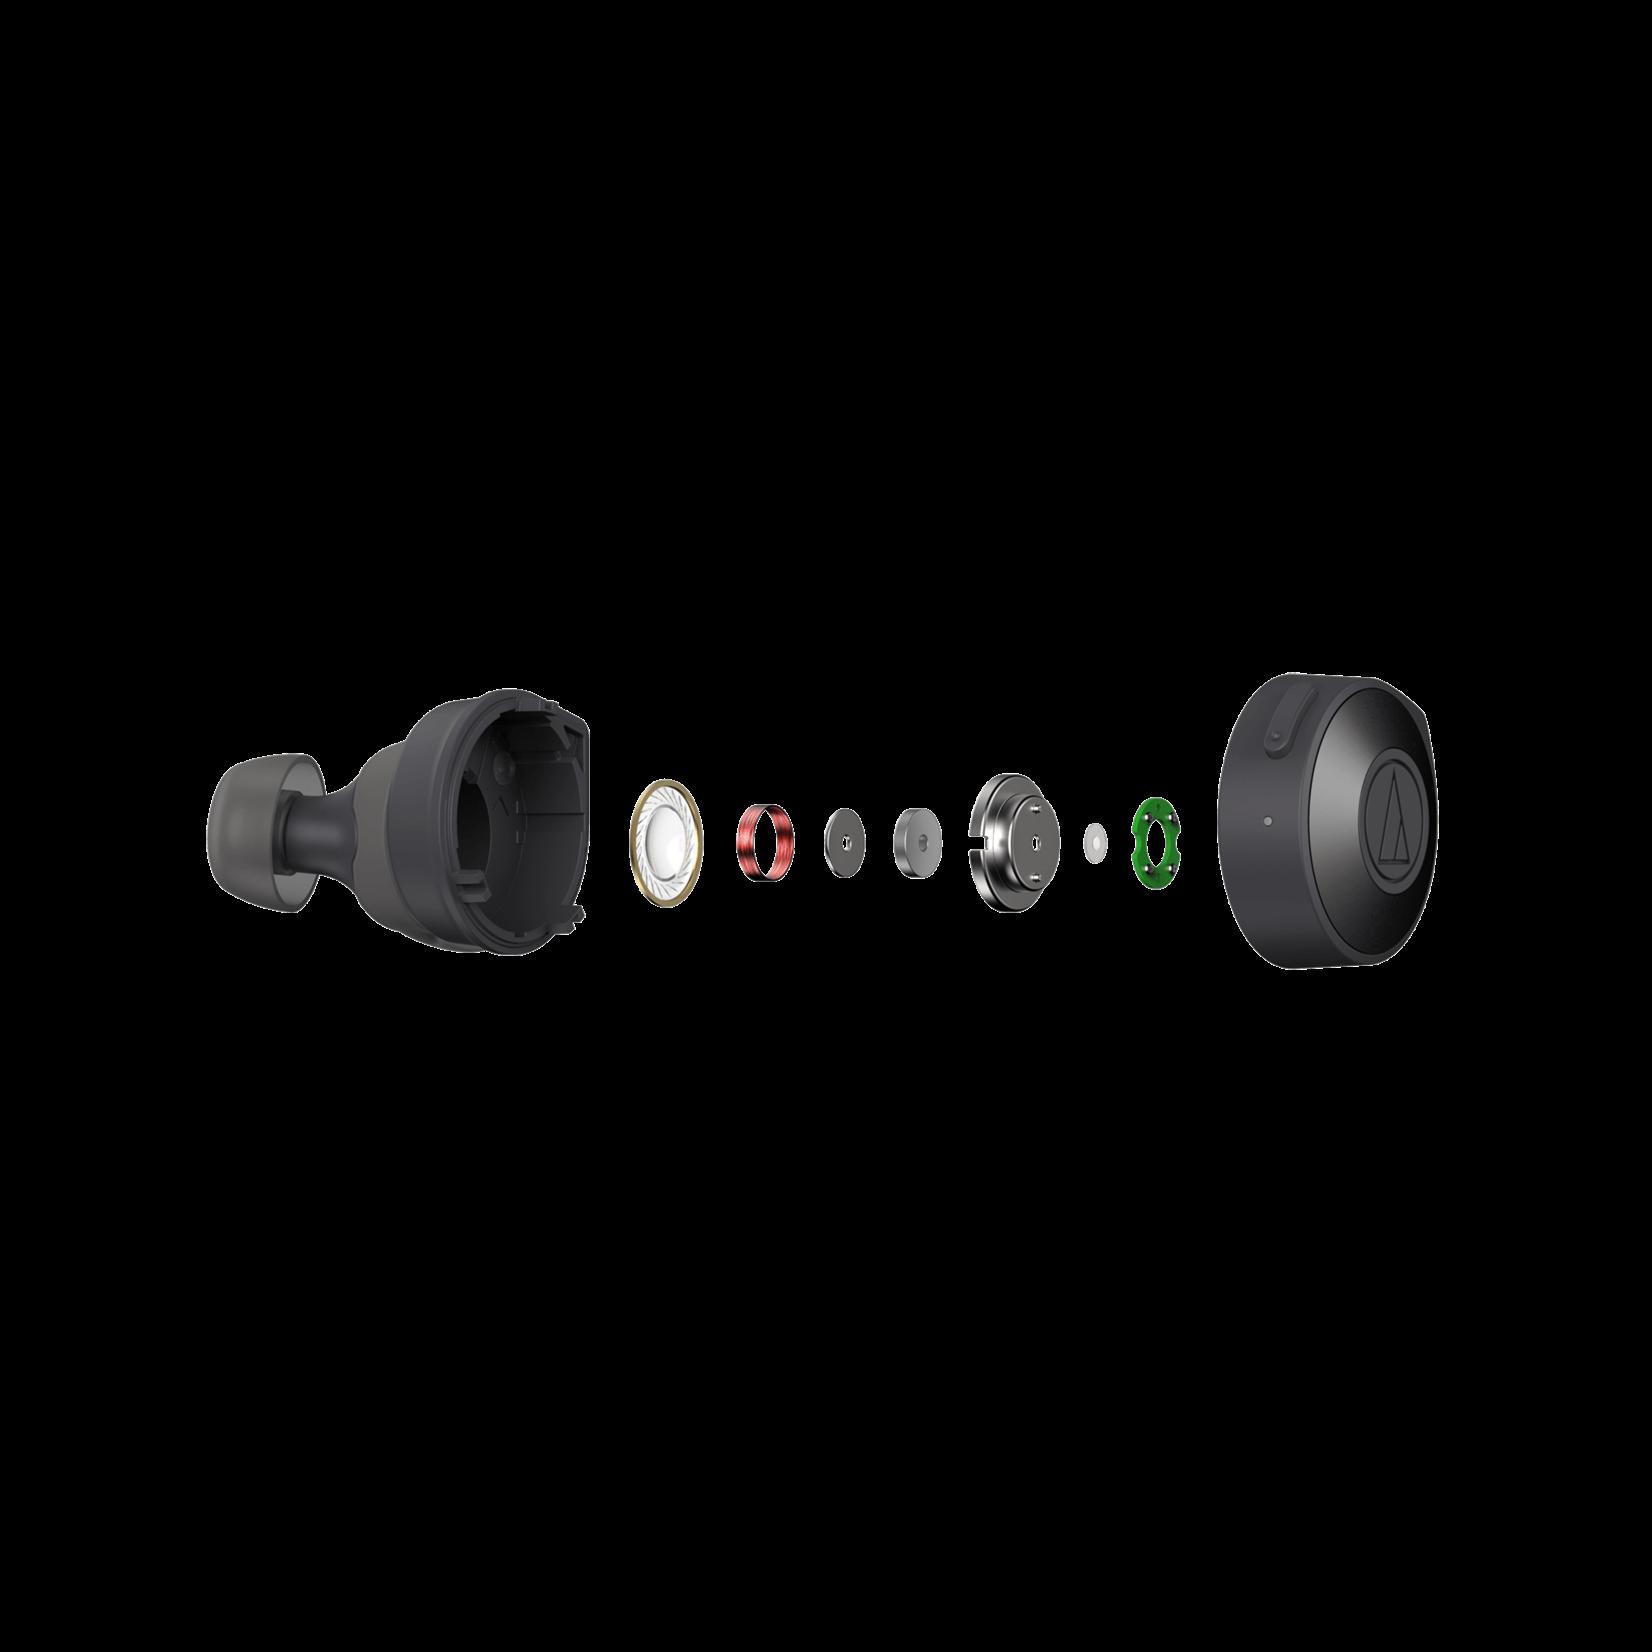 AUDIO-TECHNICA ATH-CKS5TW  WIRELESS IN-EAR HEADPHONES